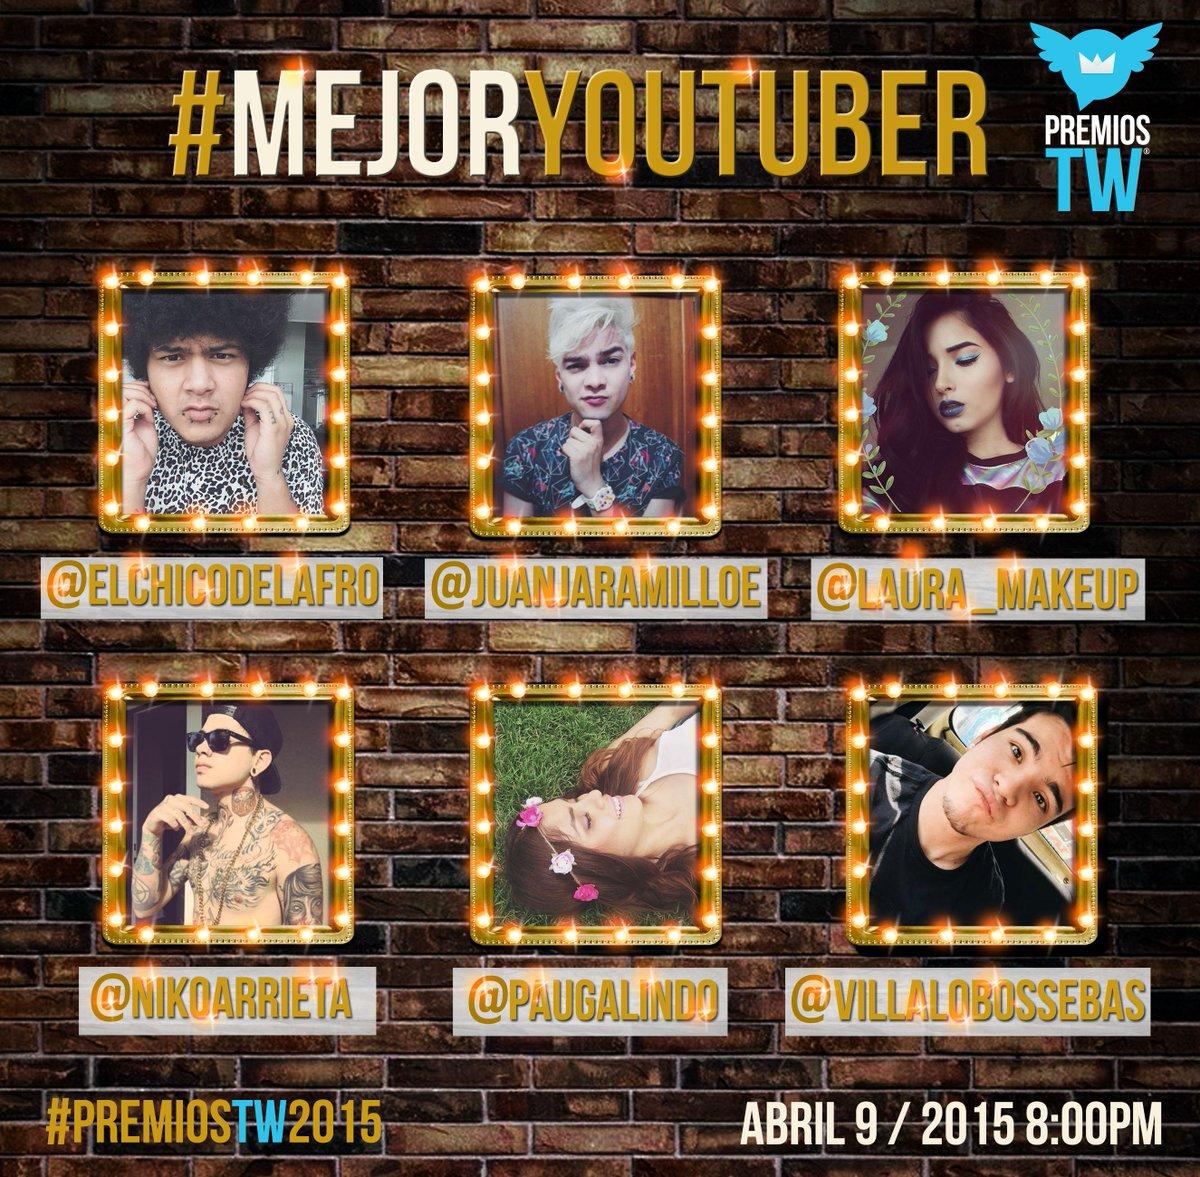 #NominadosTW2015 #MejorYoutuber part. 1 @elchicodelafro @Juanjaramilloe @laura_makeup http://t.co/m9OUs4CDuO http://t.co/1MdYE2jKYG